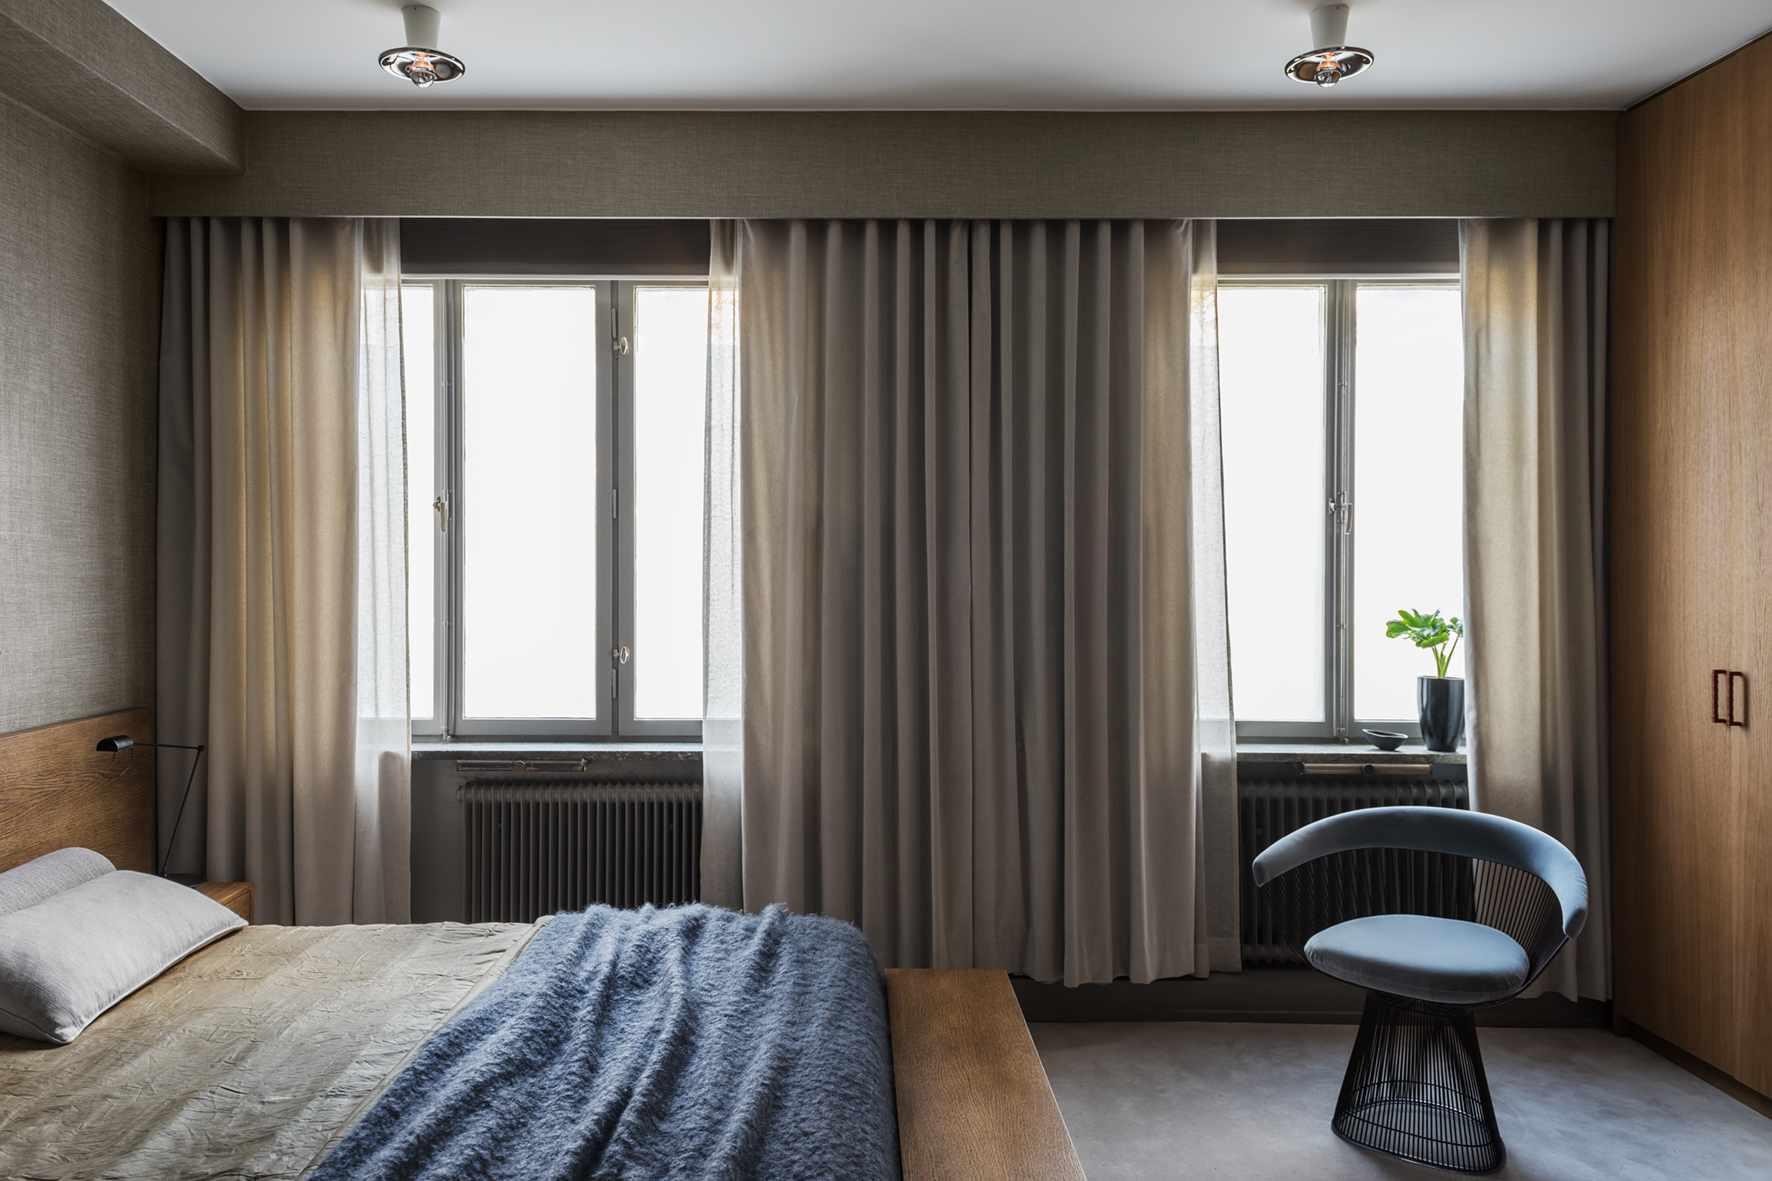 Sleek modern bedroom with minimal overhead lights